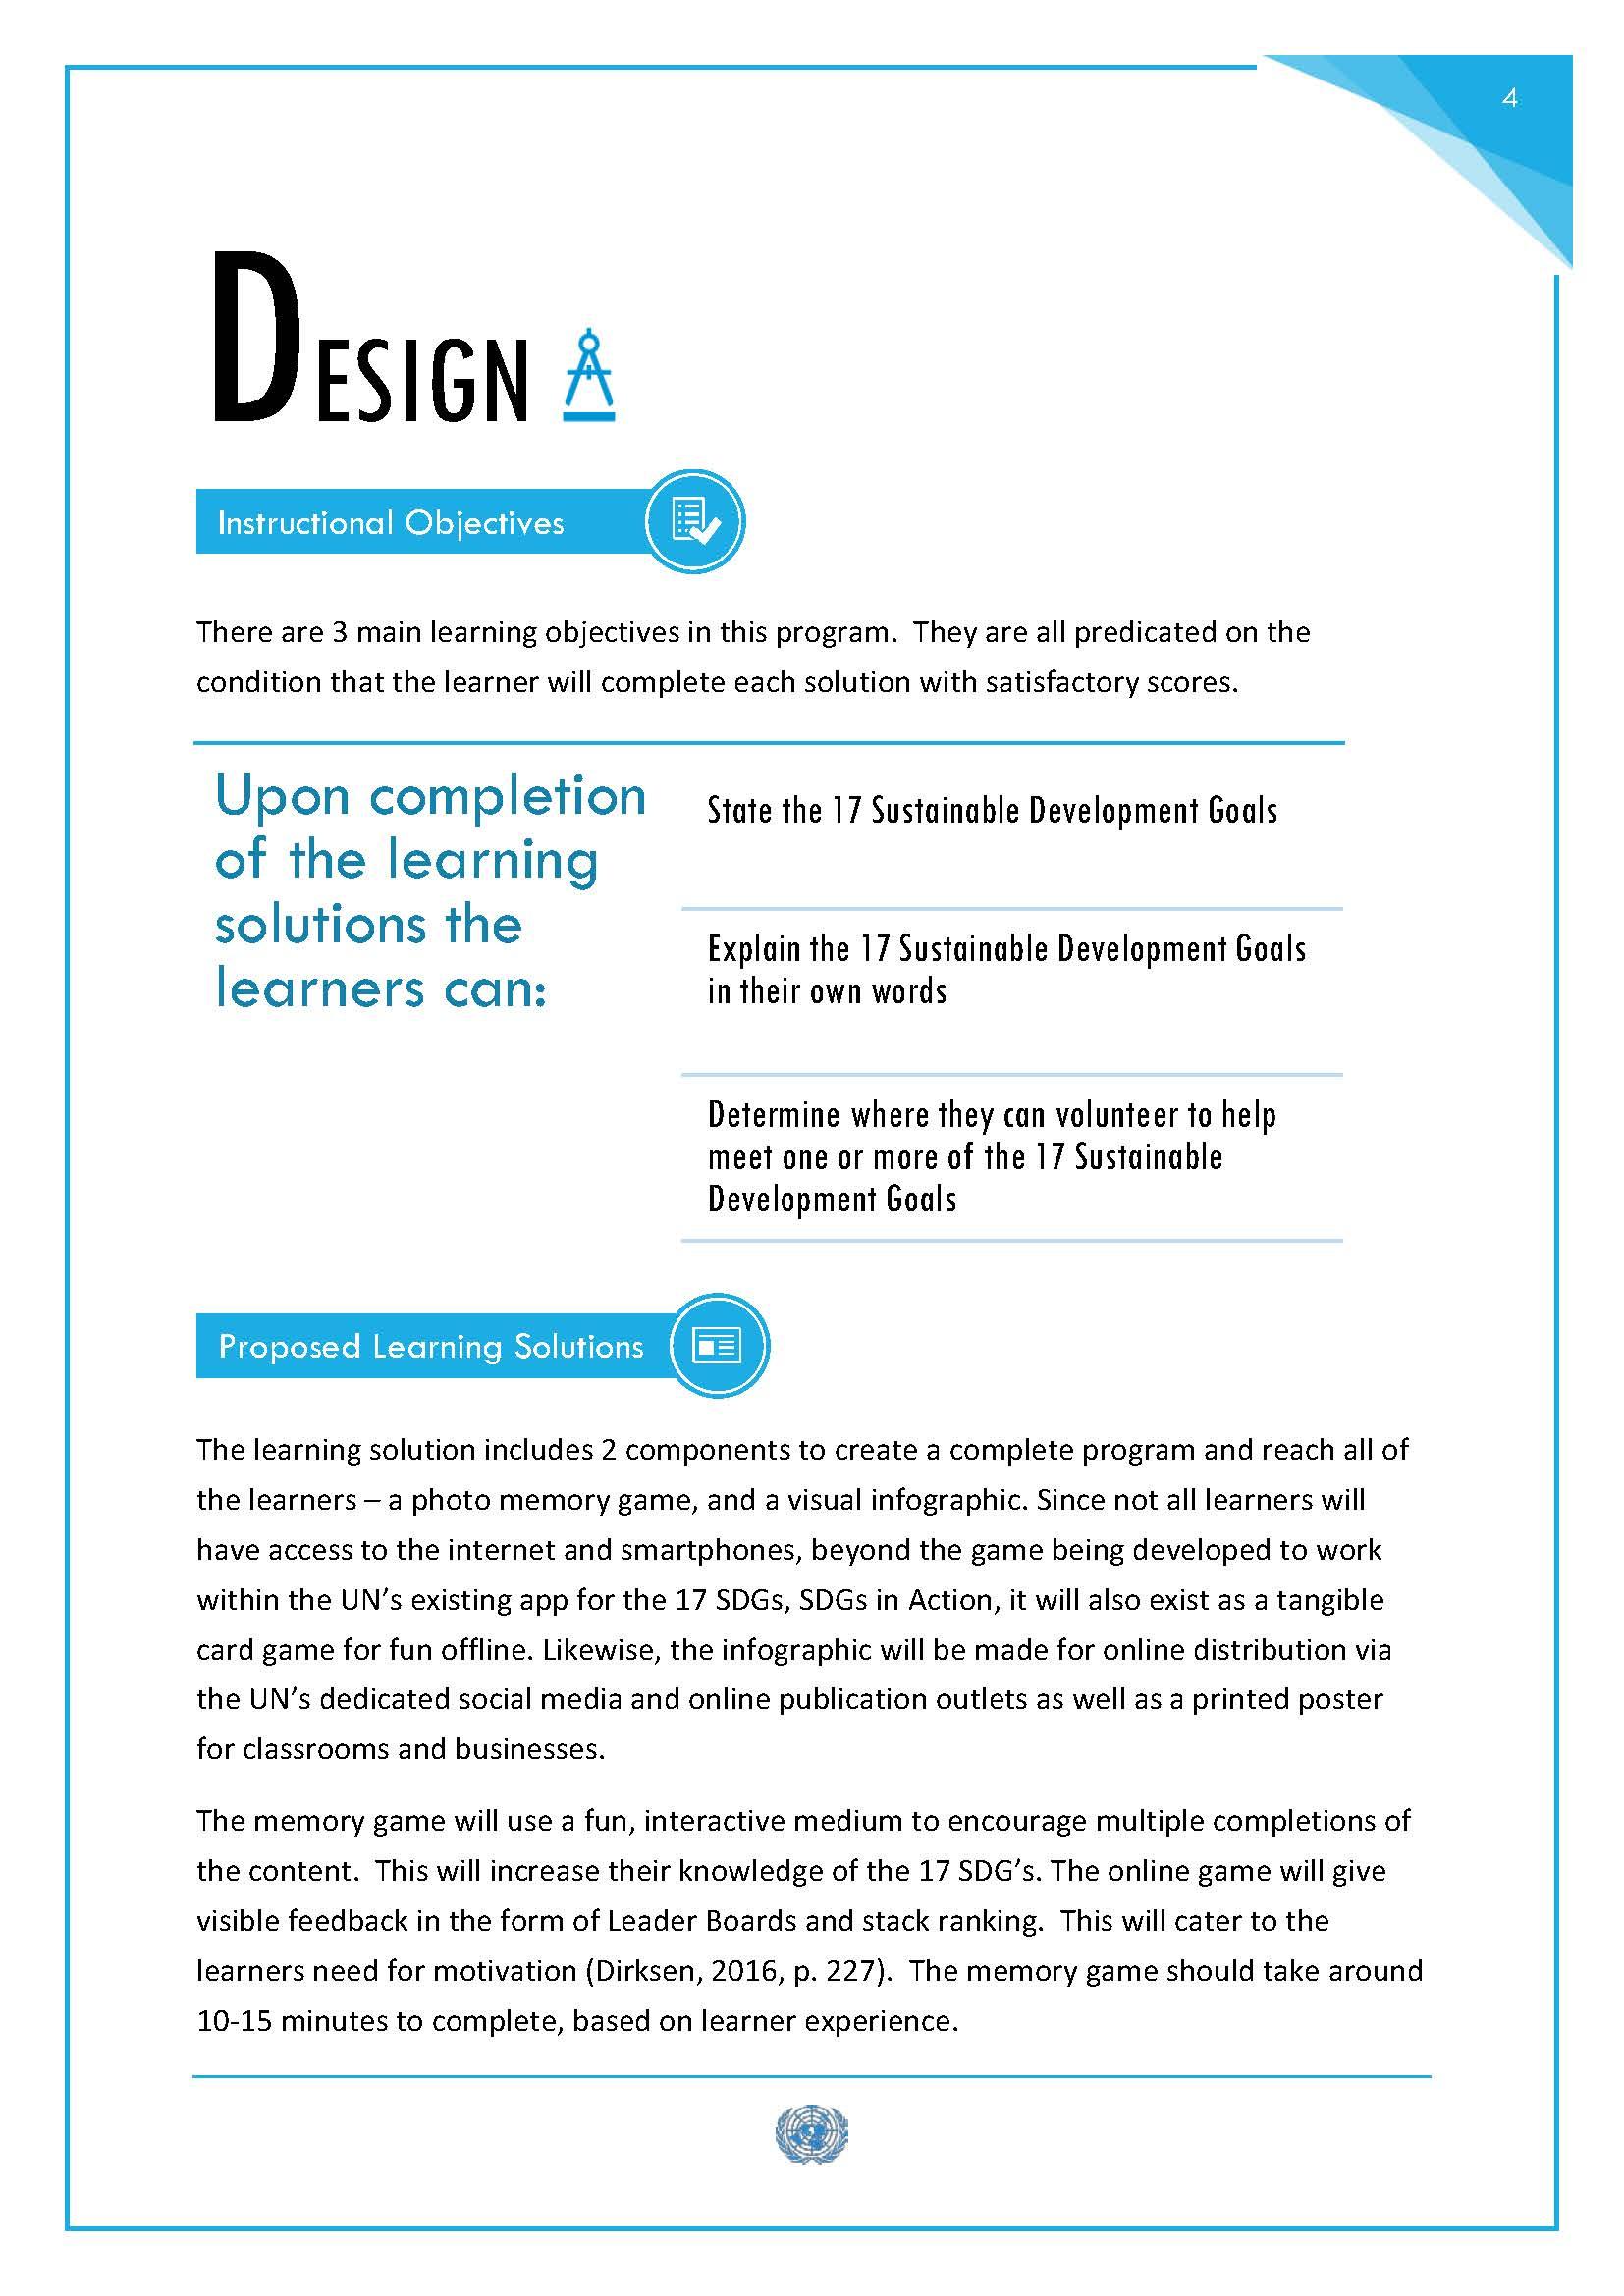 Design Document_Kraus&Beatty_Page_05.jpg